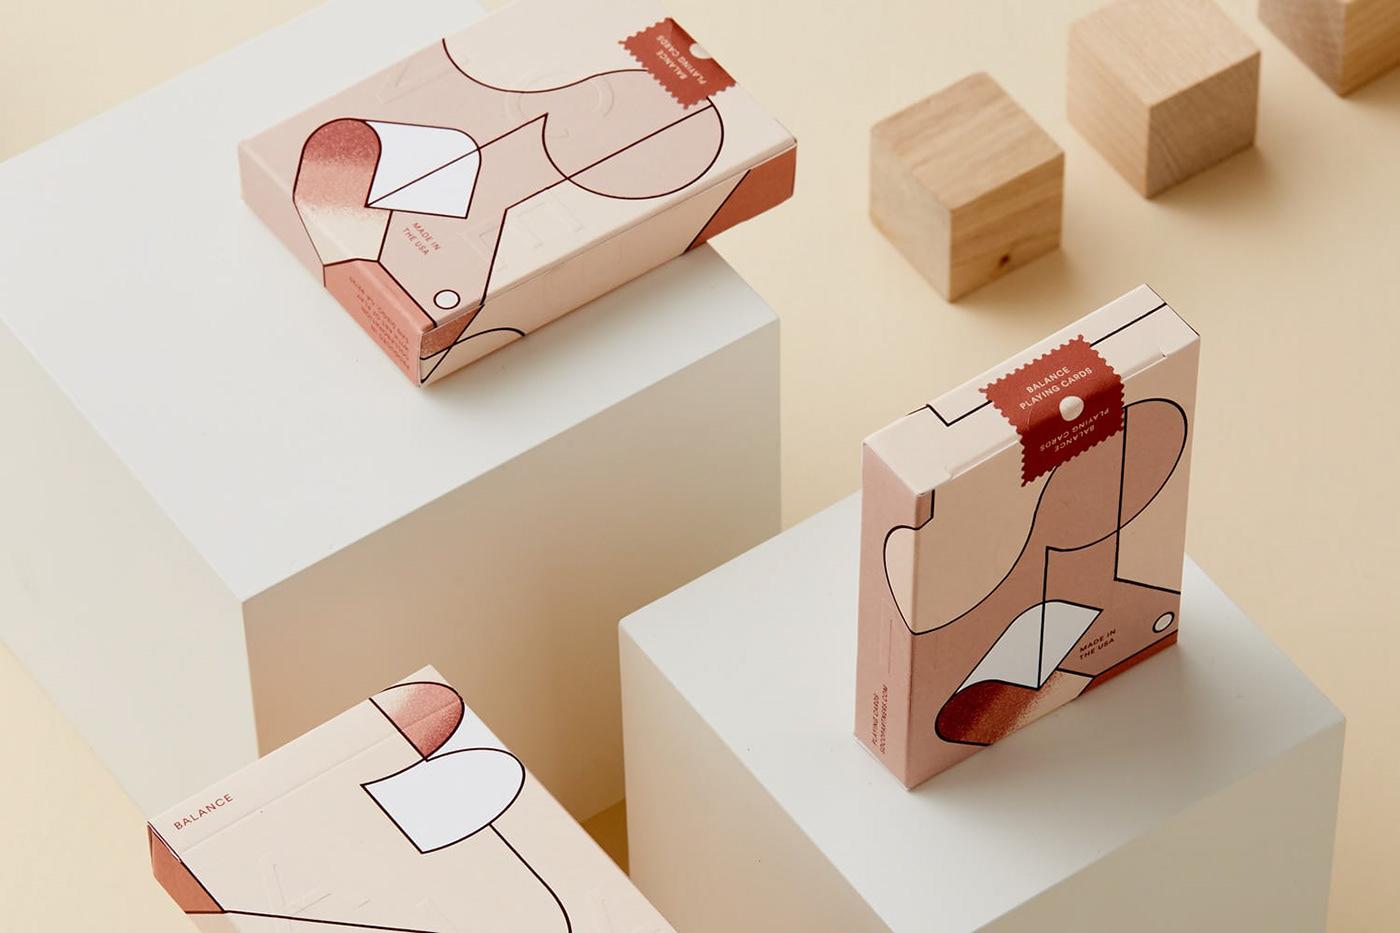 Image may contain: box, drawing and indoor